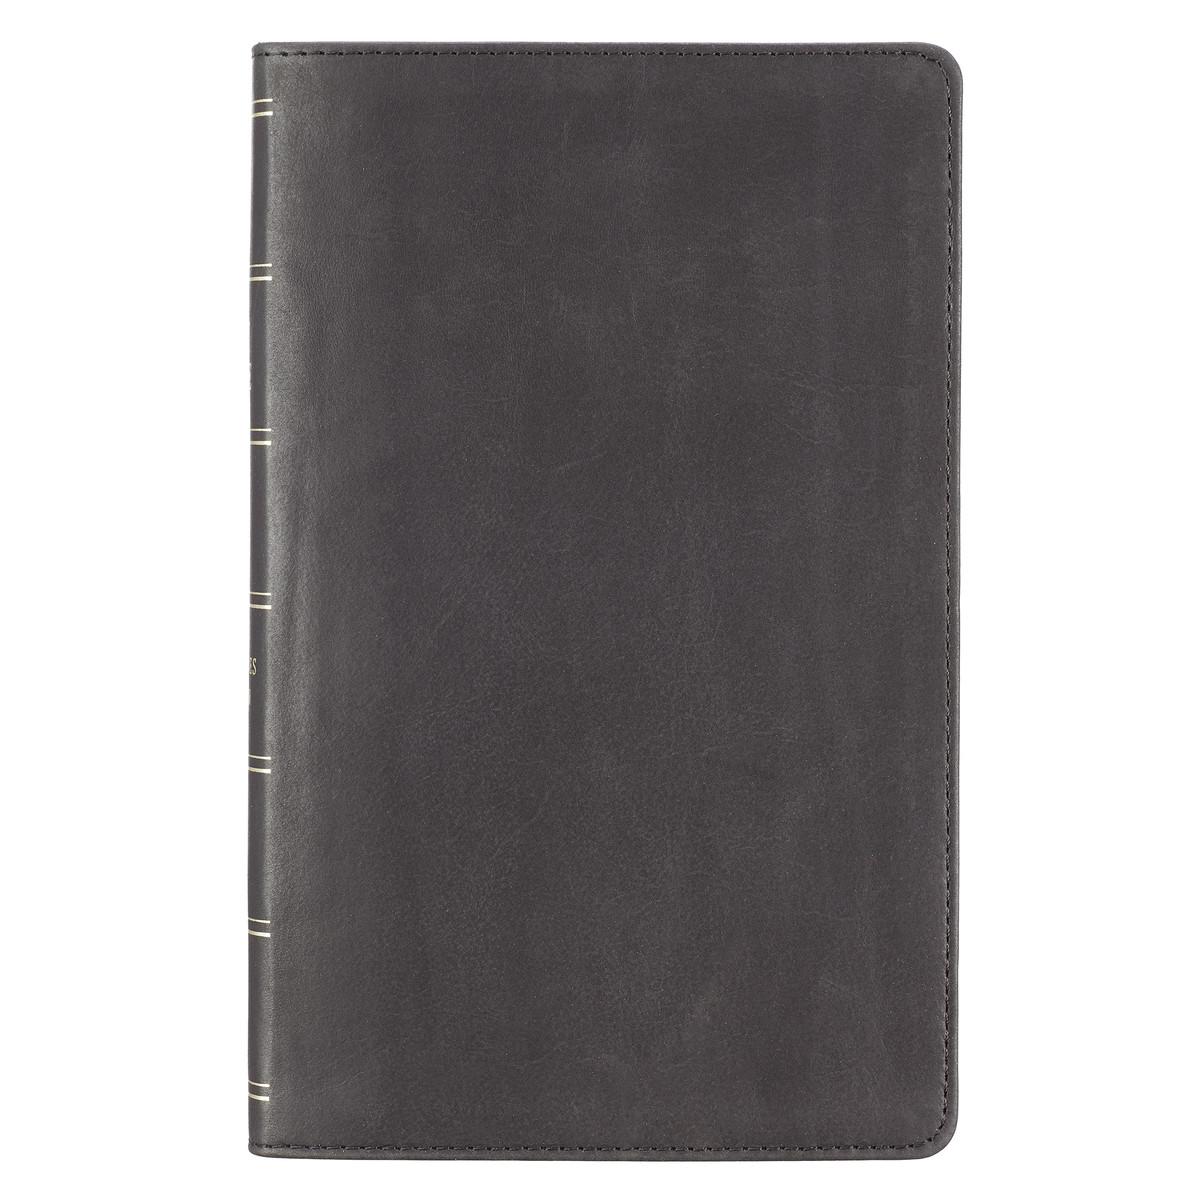 Premium Leather Black KJV Bible Giant Print